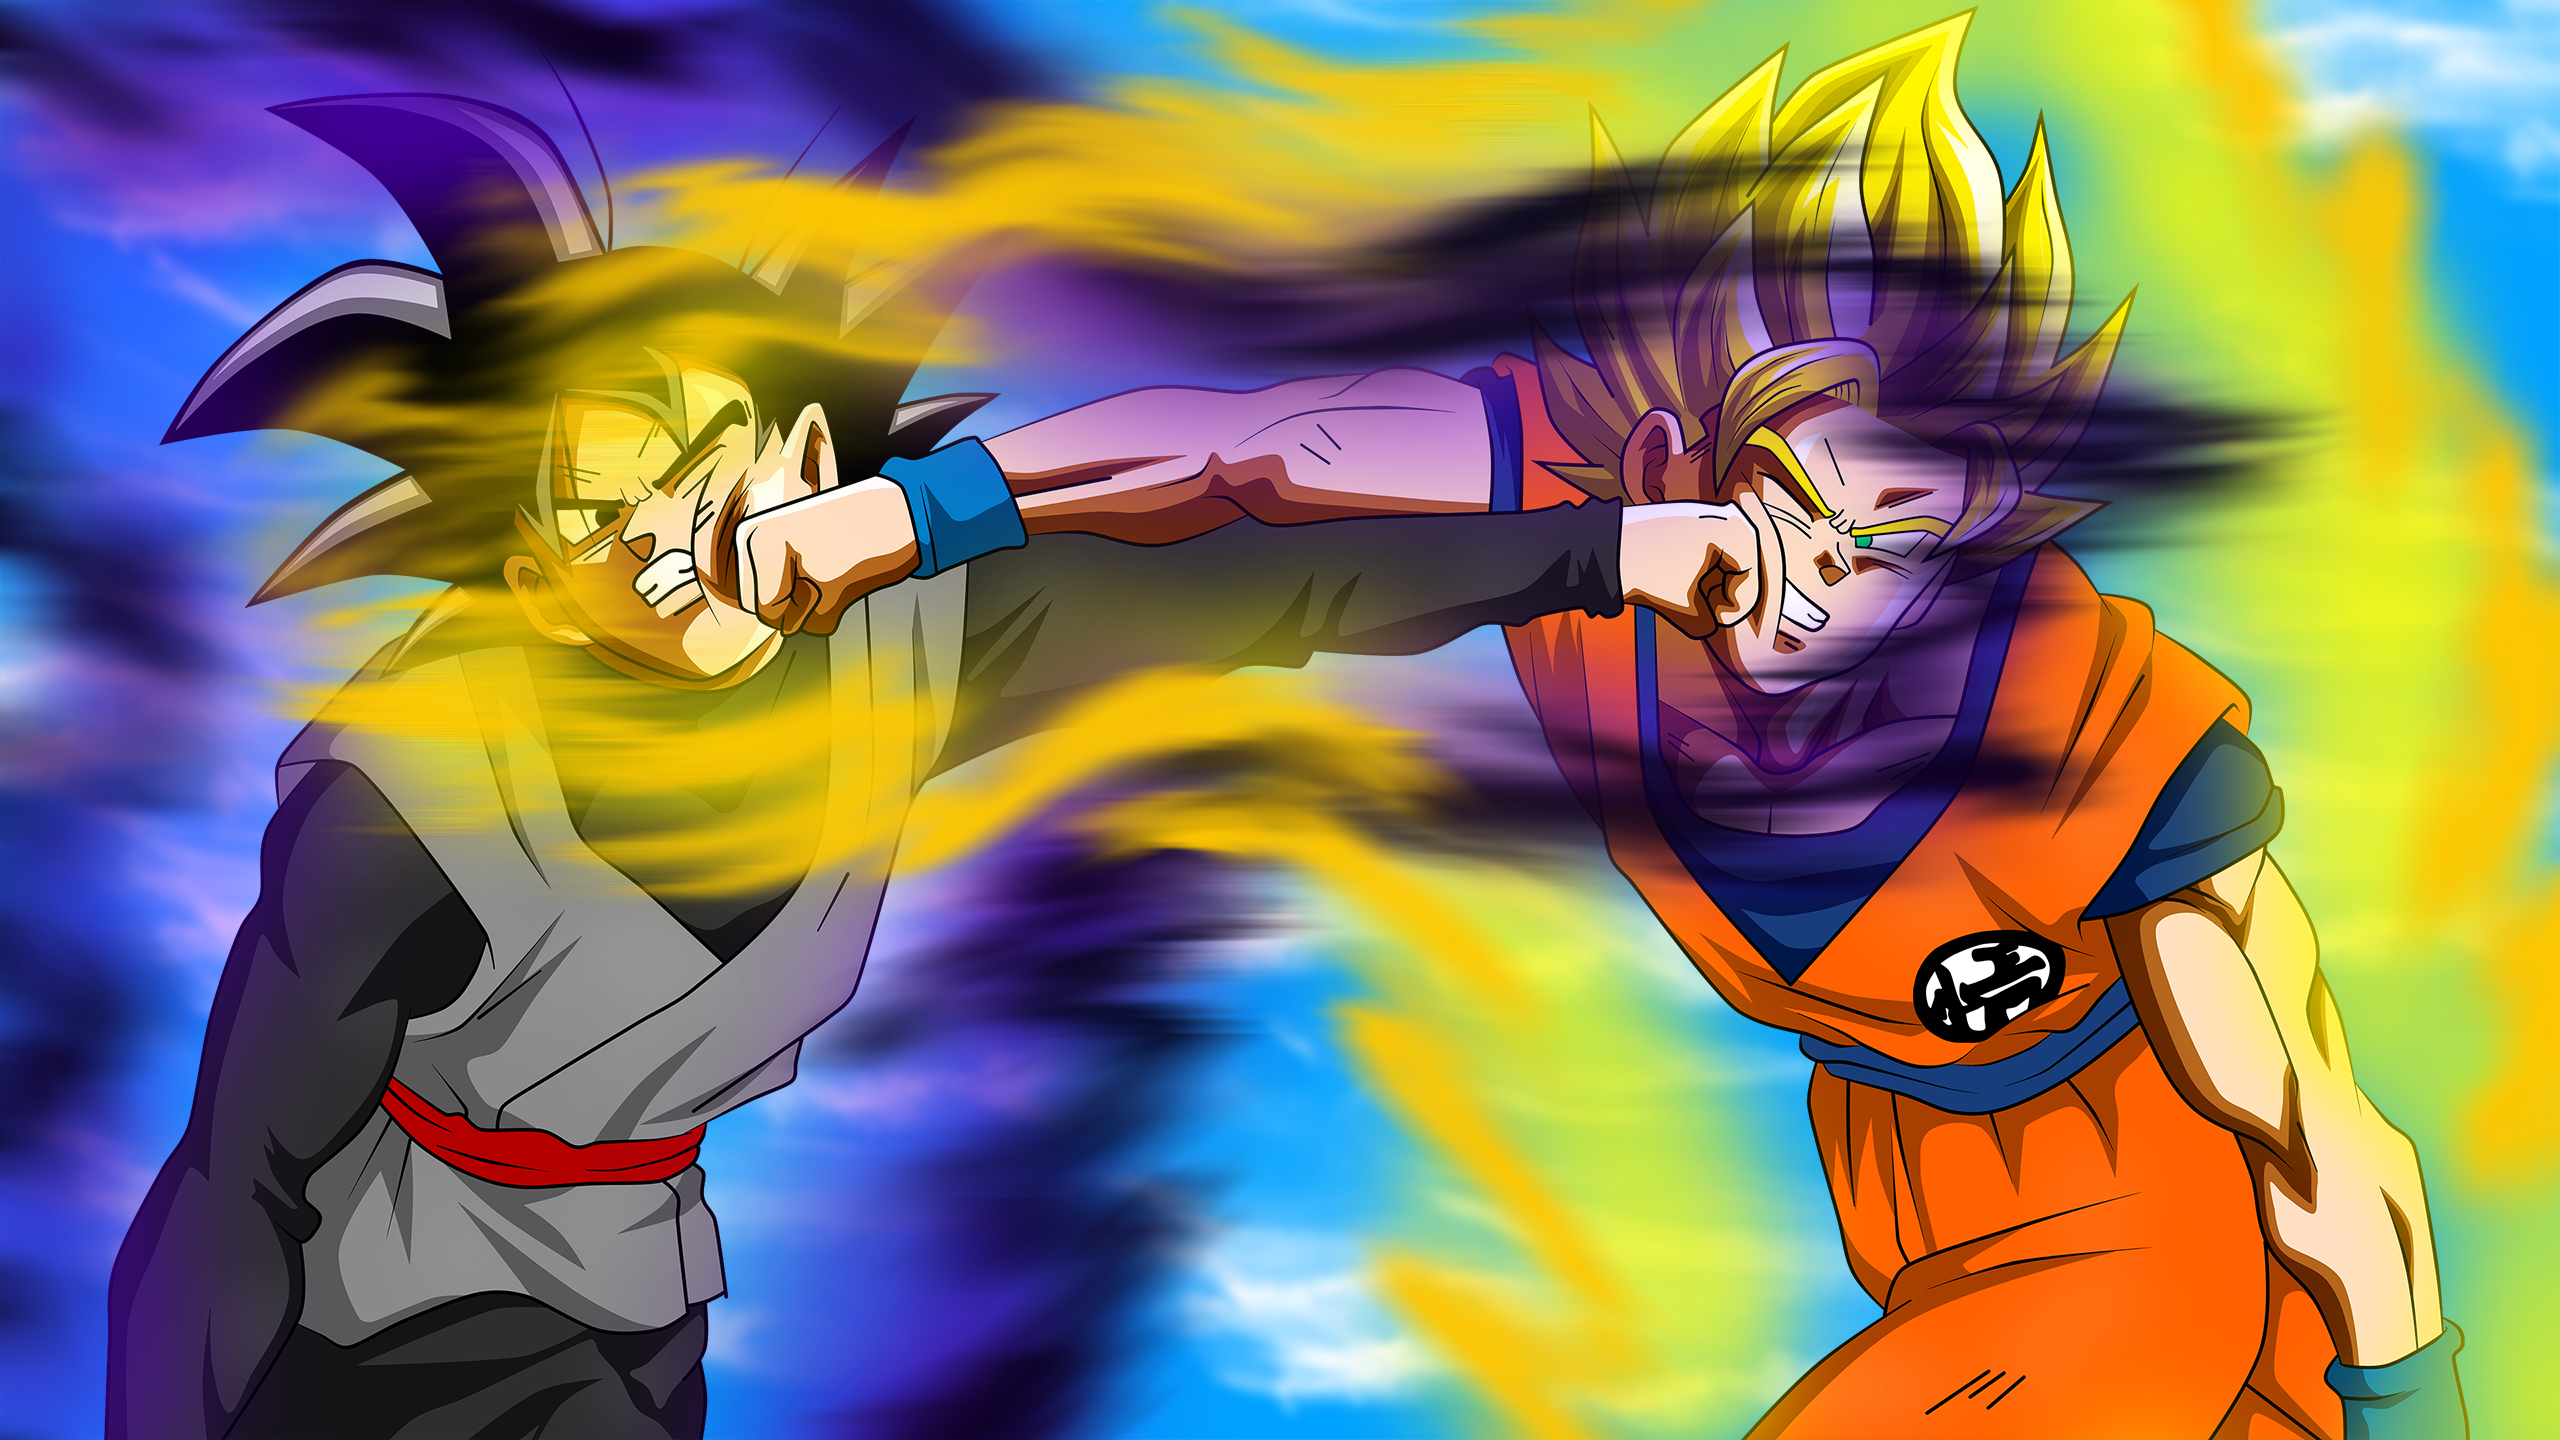 Black Goku Fondo De Pantalla And Fondo De Escritorio: 75 Black Goku Fondos De Pantalla HD